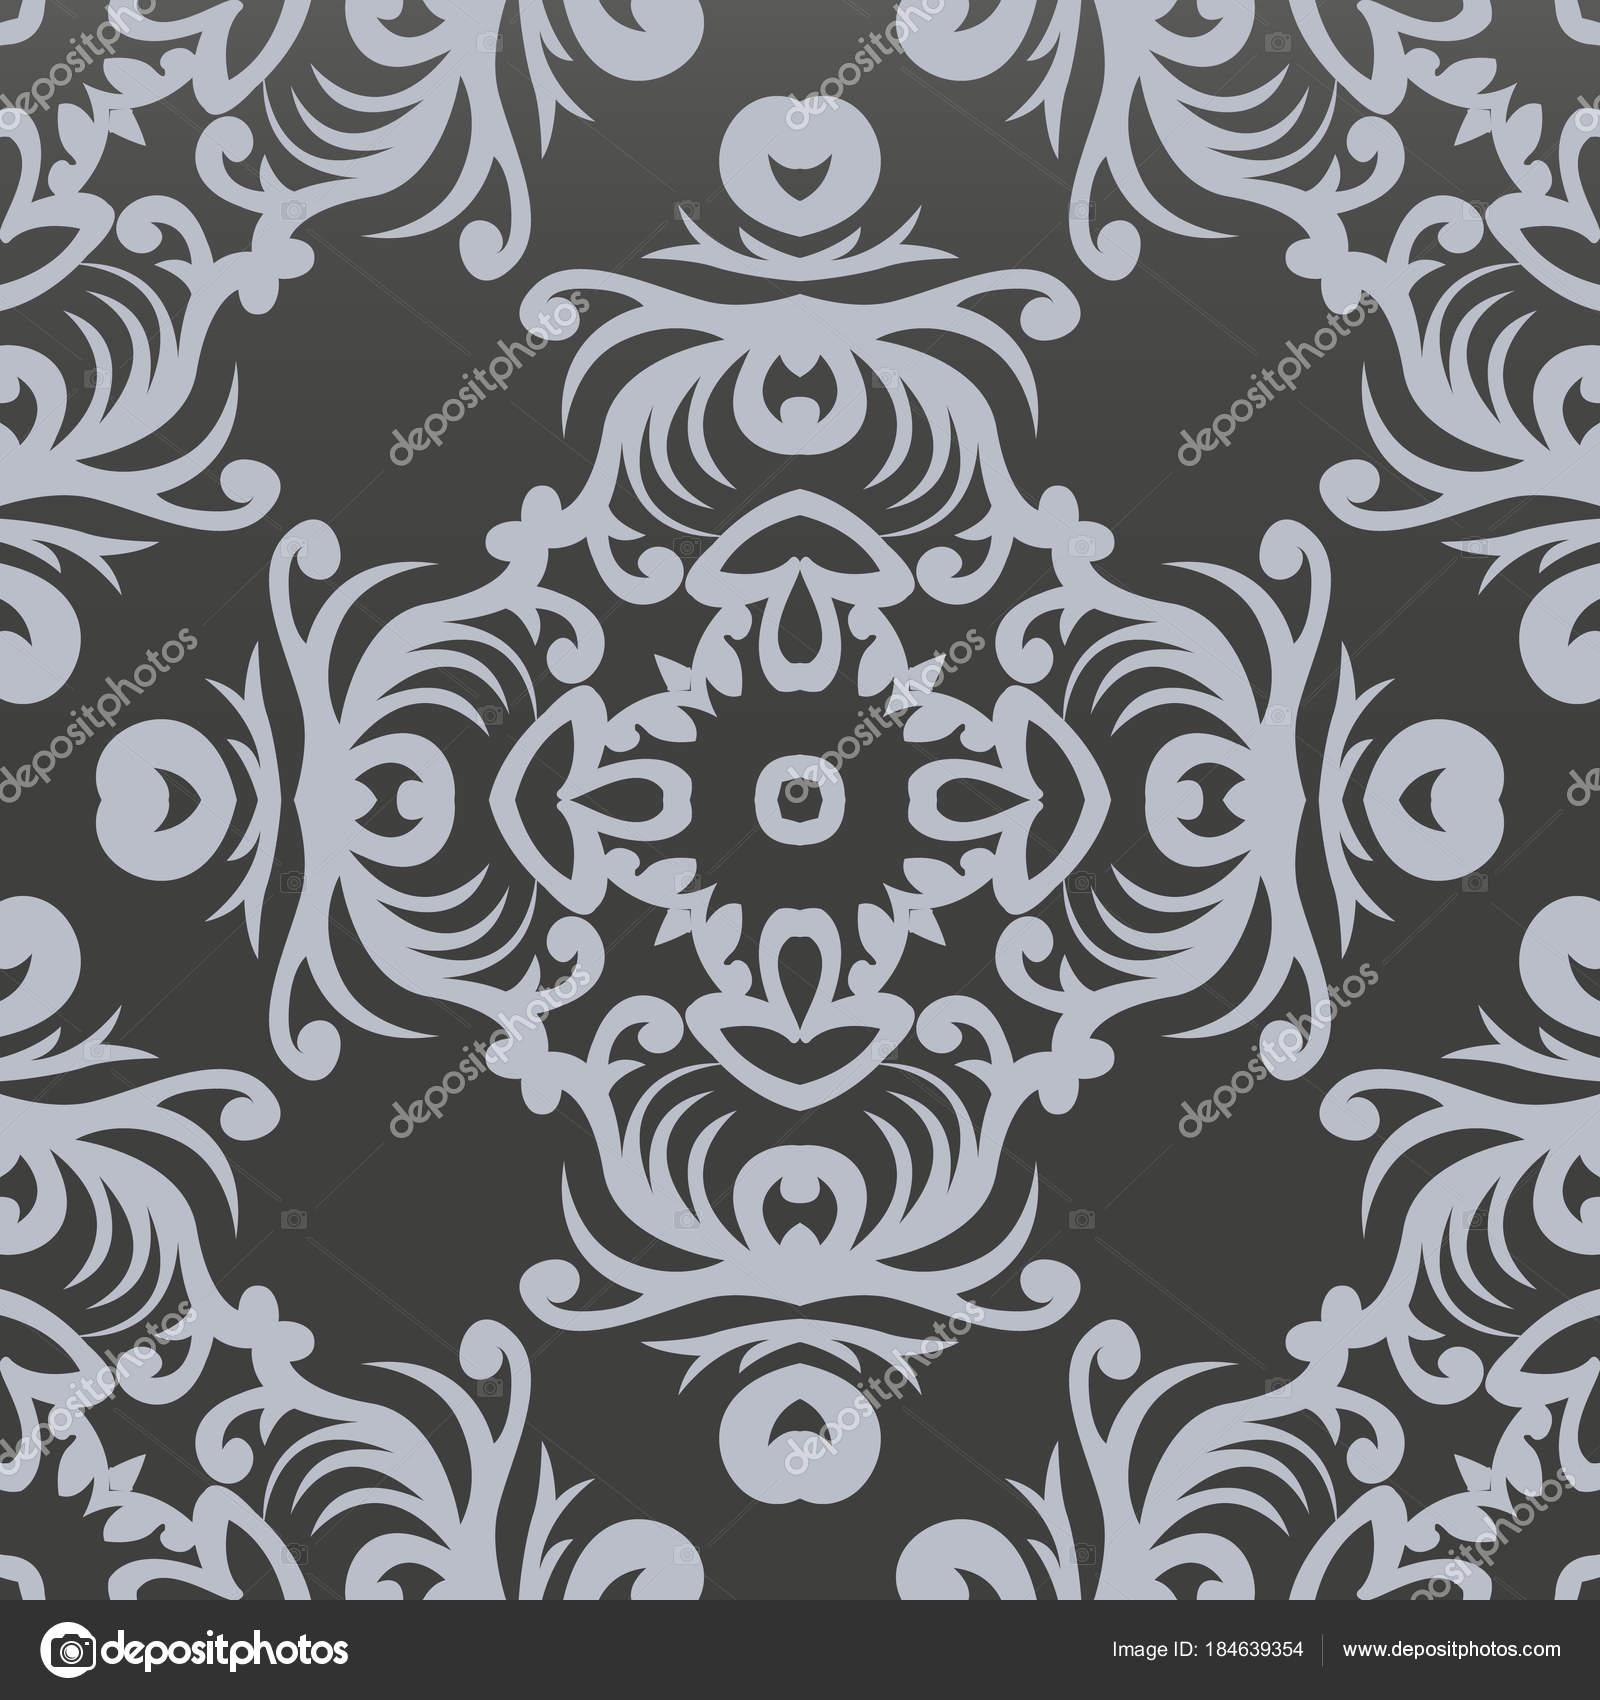 Textile Stock Distributors Mail: Ornamento De Oriental. Impressão De Têxteis. Desenho